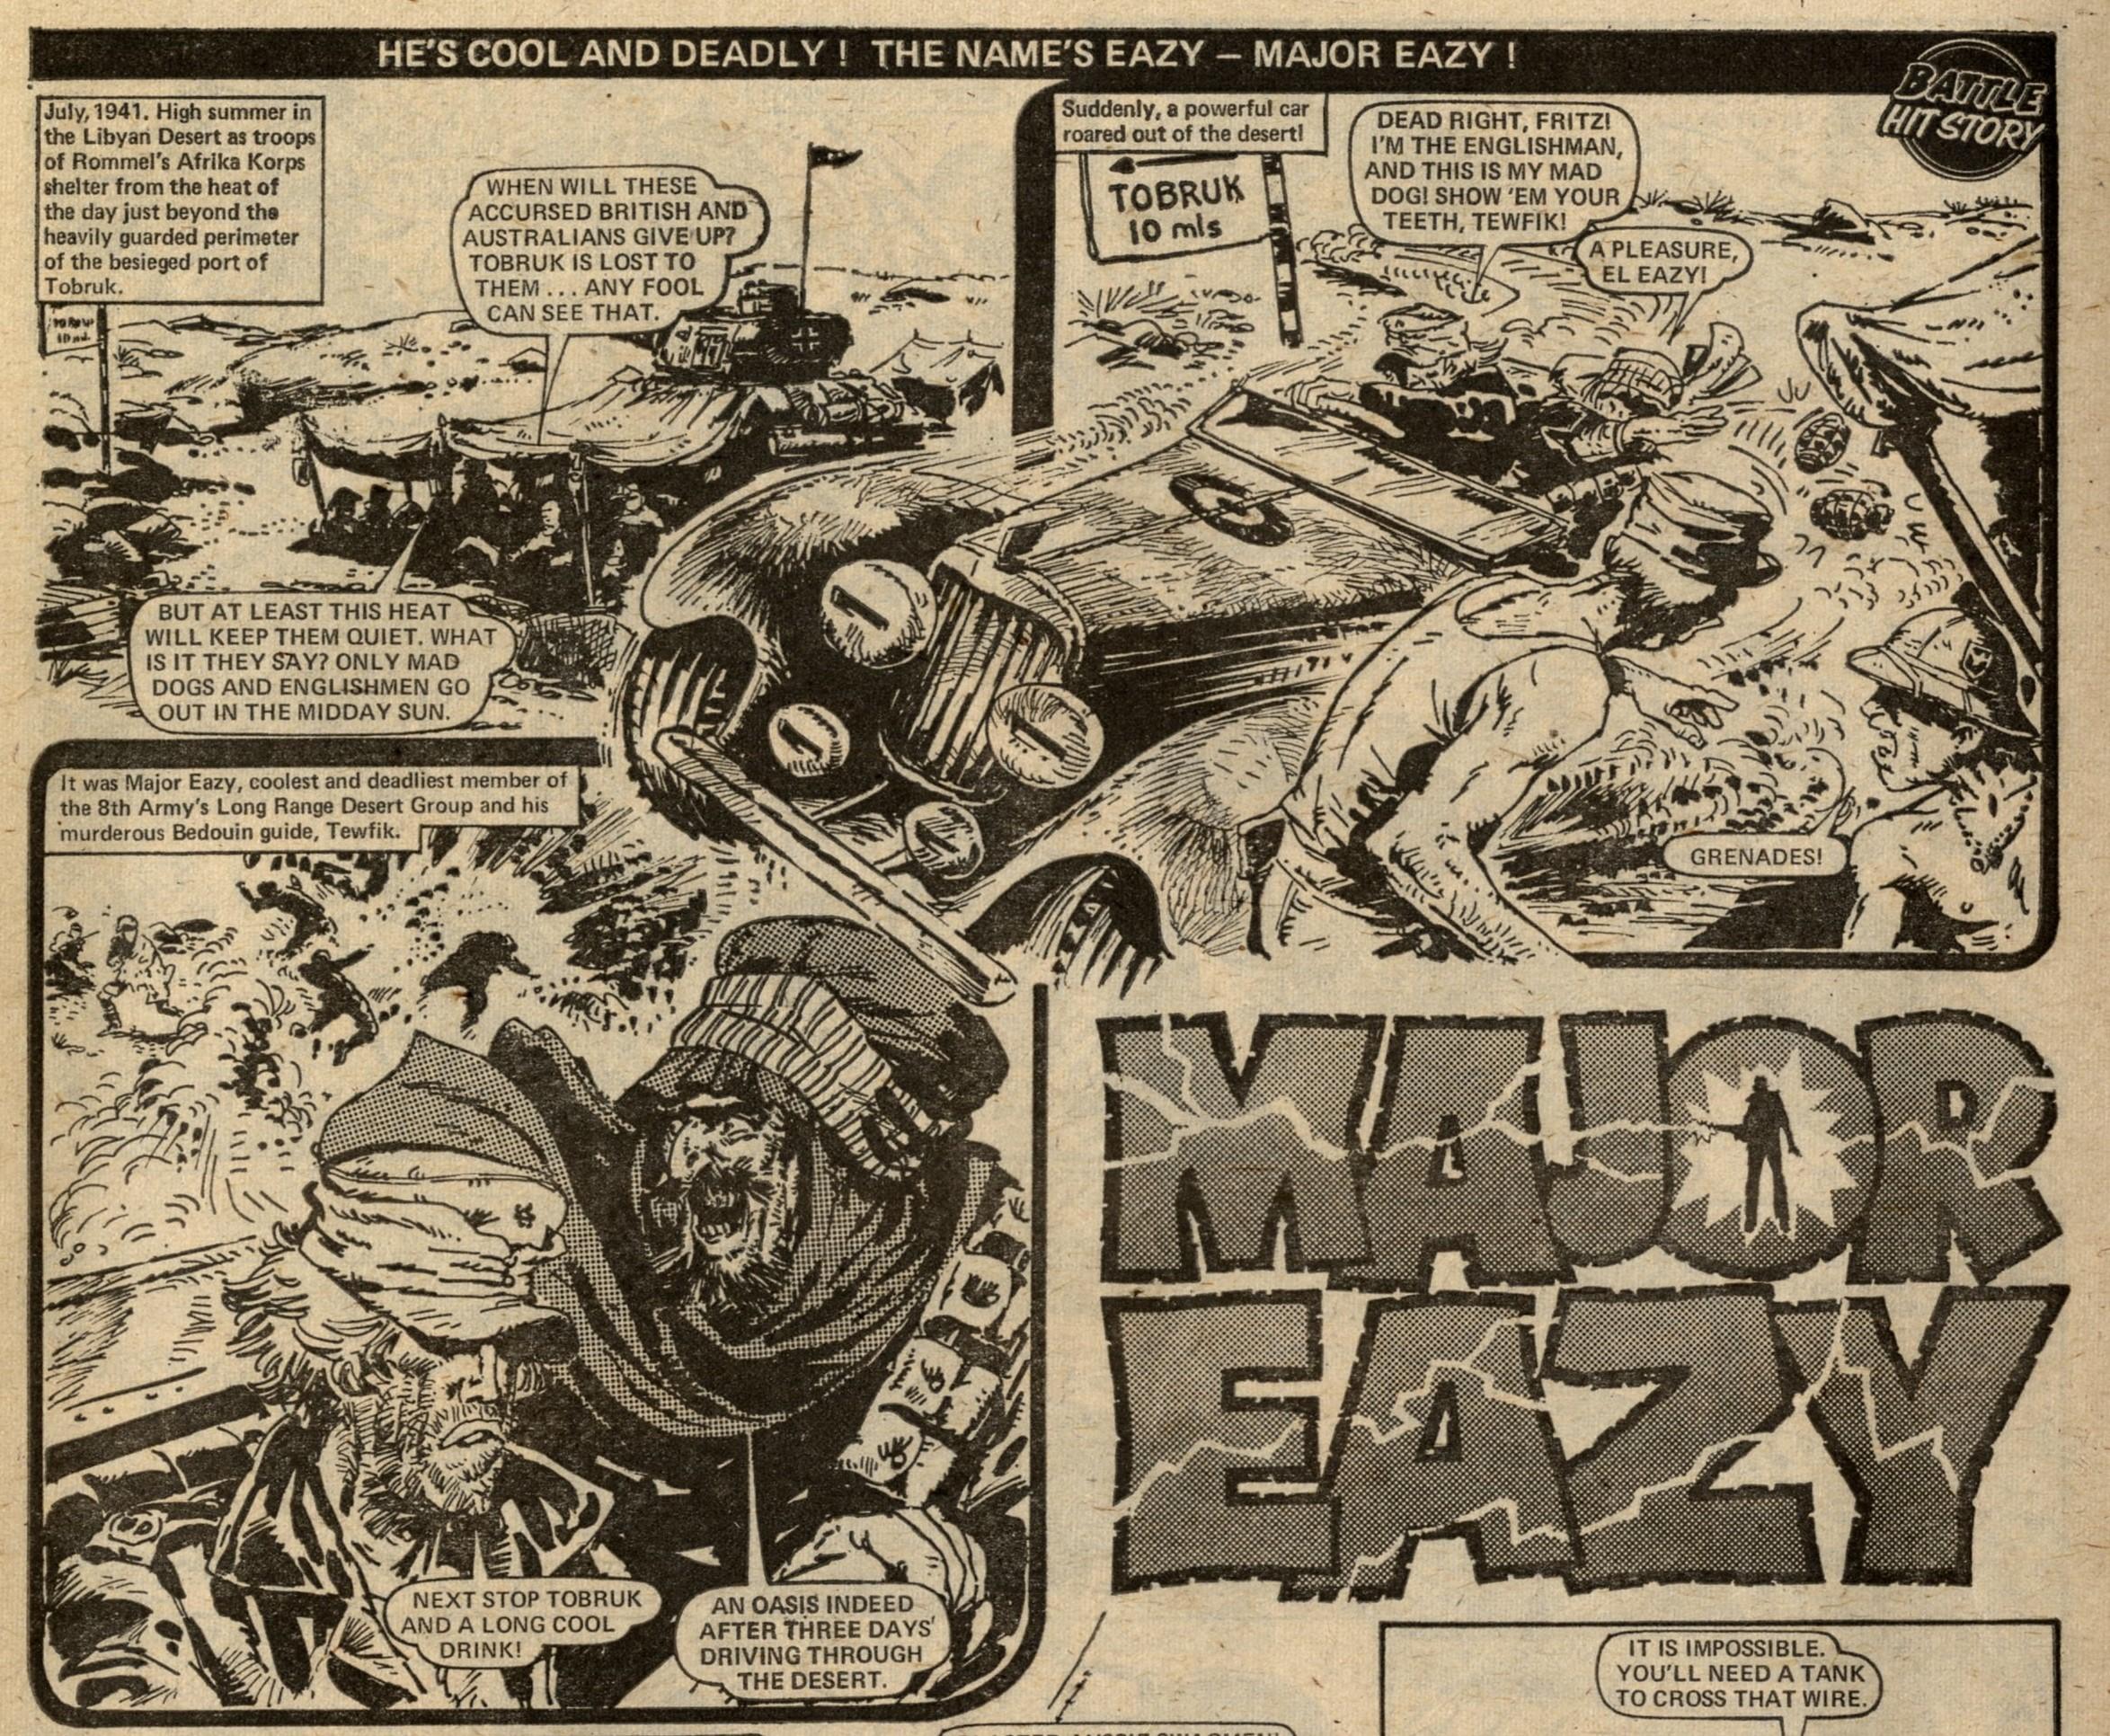 Major Eazy: Alan Hebden (writer), Carlos Ezquerra (artist)